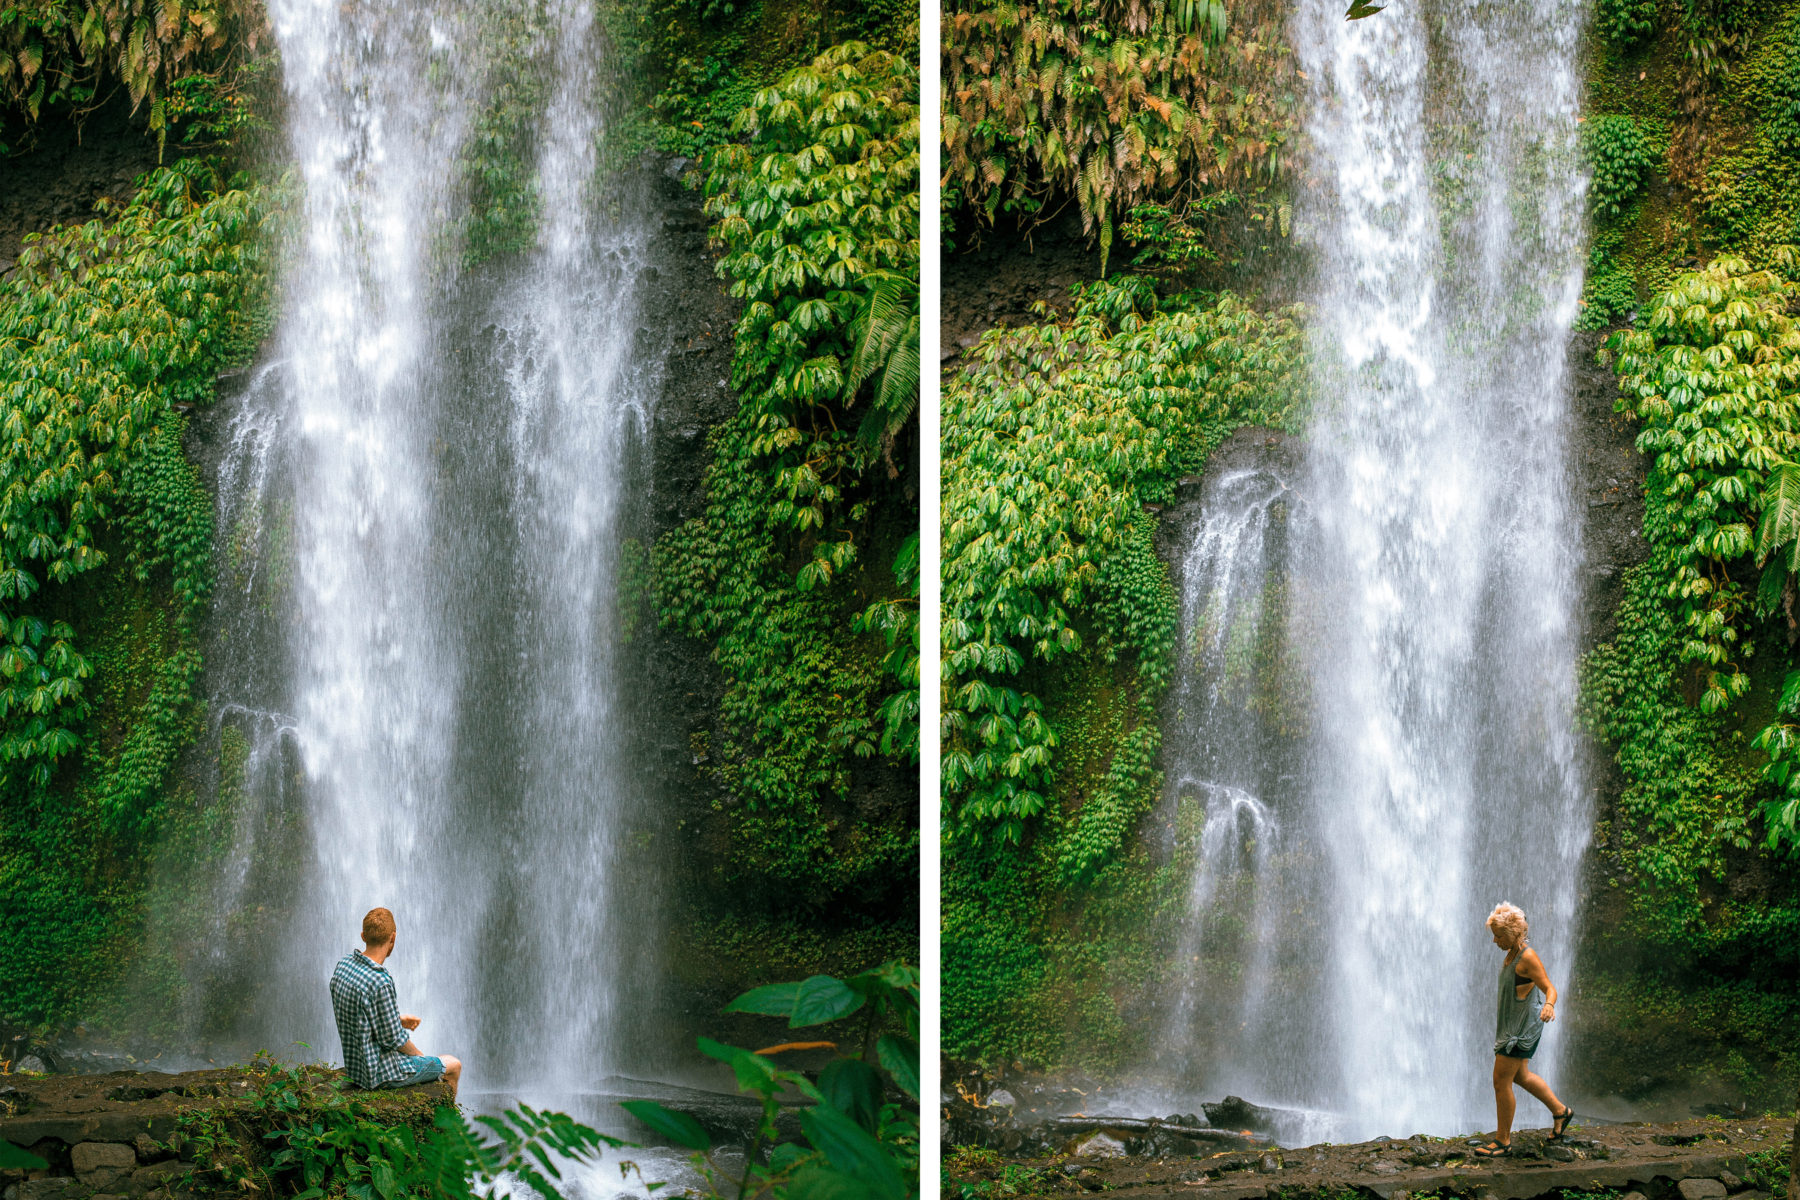 lombok indonesia waterfall green lush jungle exploring traveling